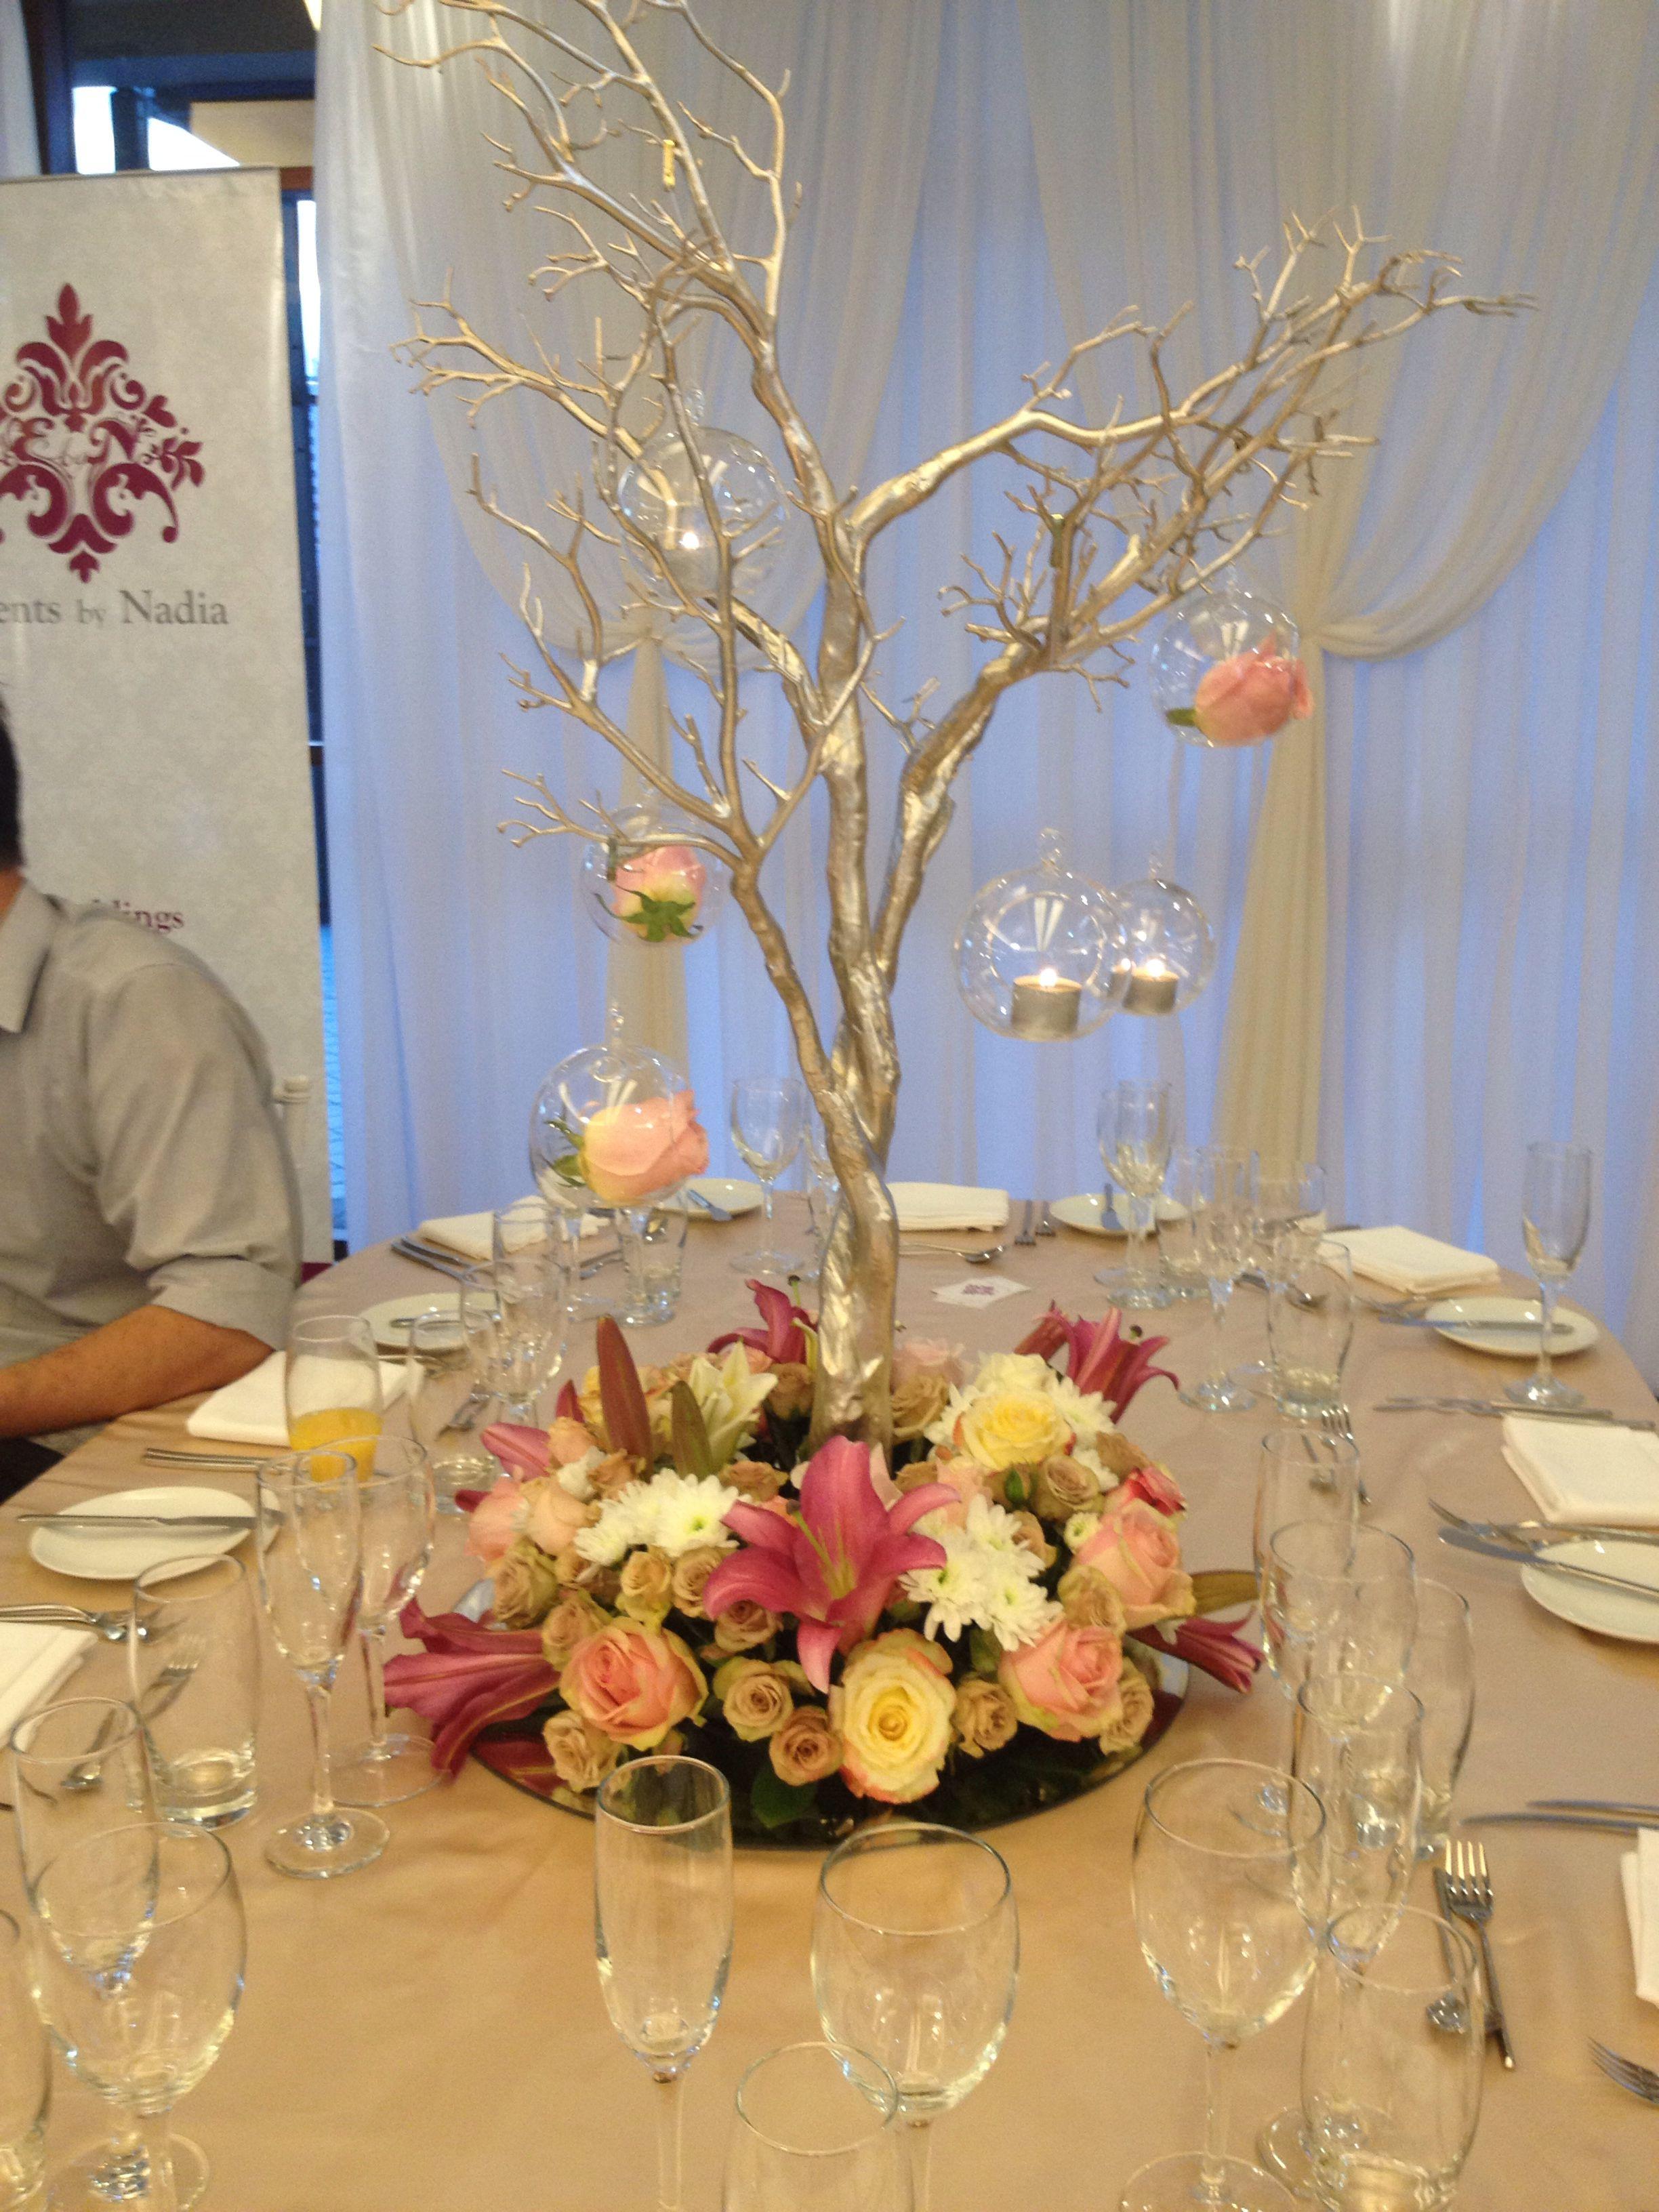 Floral wedding centrepiece fall wedding centerpieces